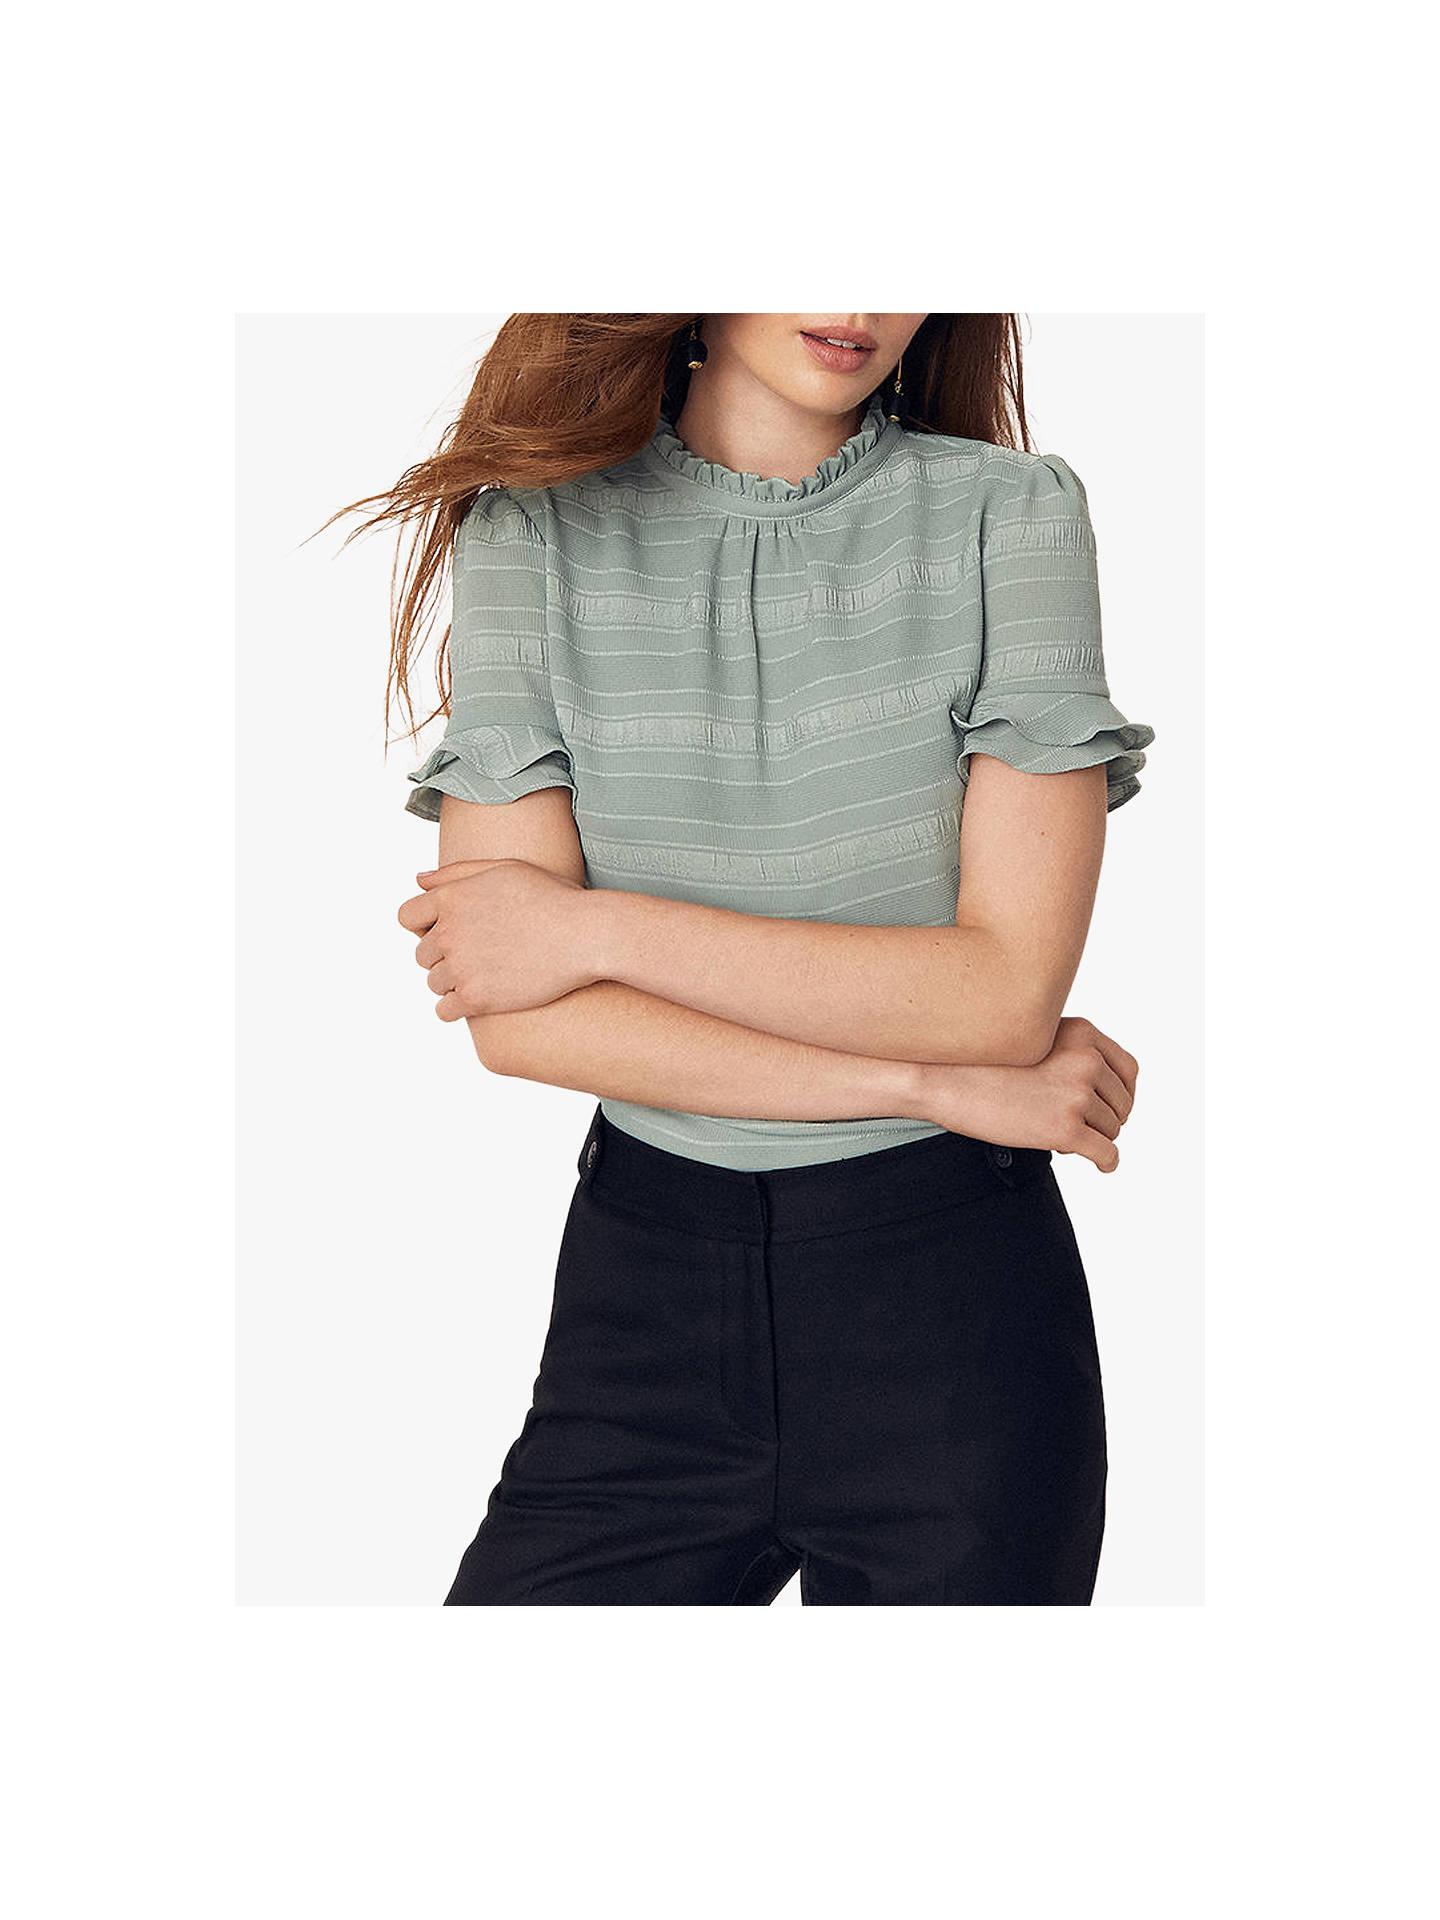 Oasis Stripe Frill Top, Khaki by Oasis